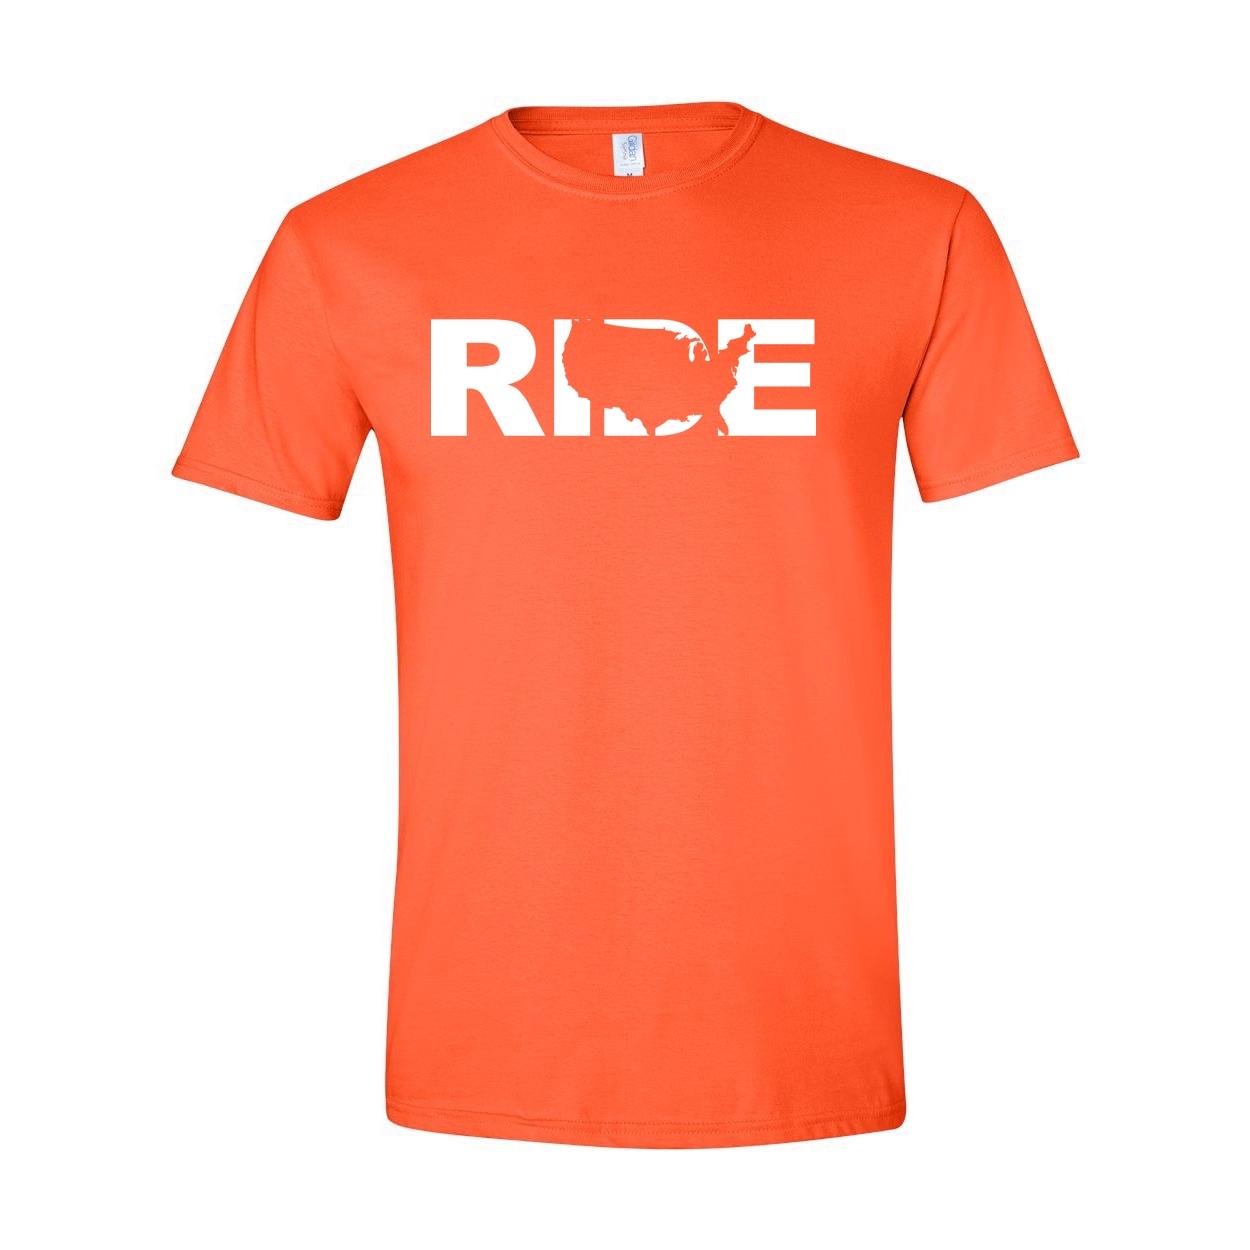 Ride United States Classic T-Shirt Orange (White Logo)